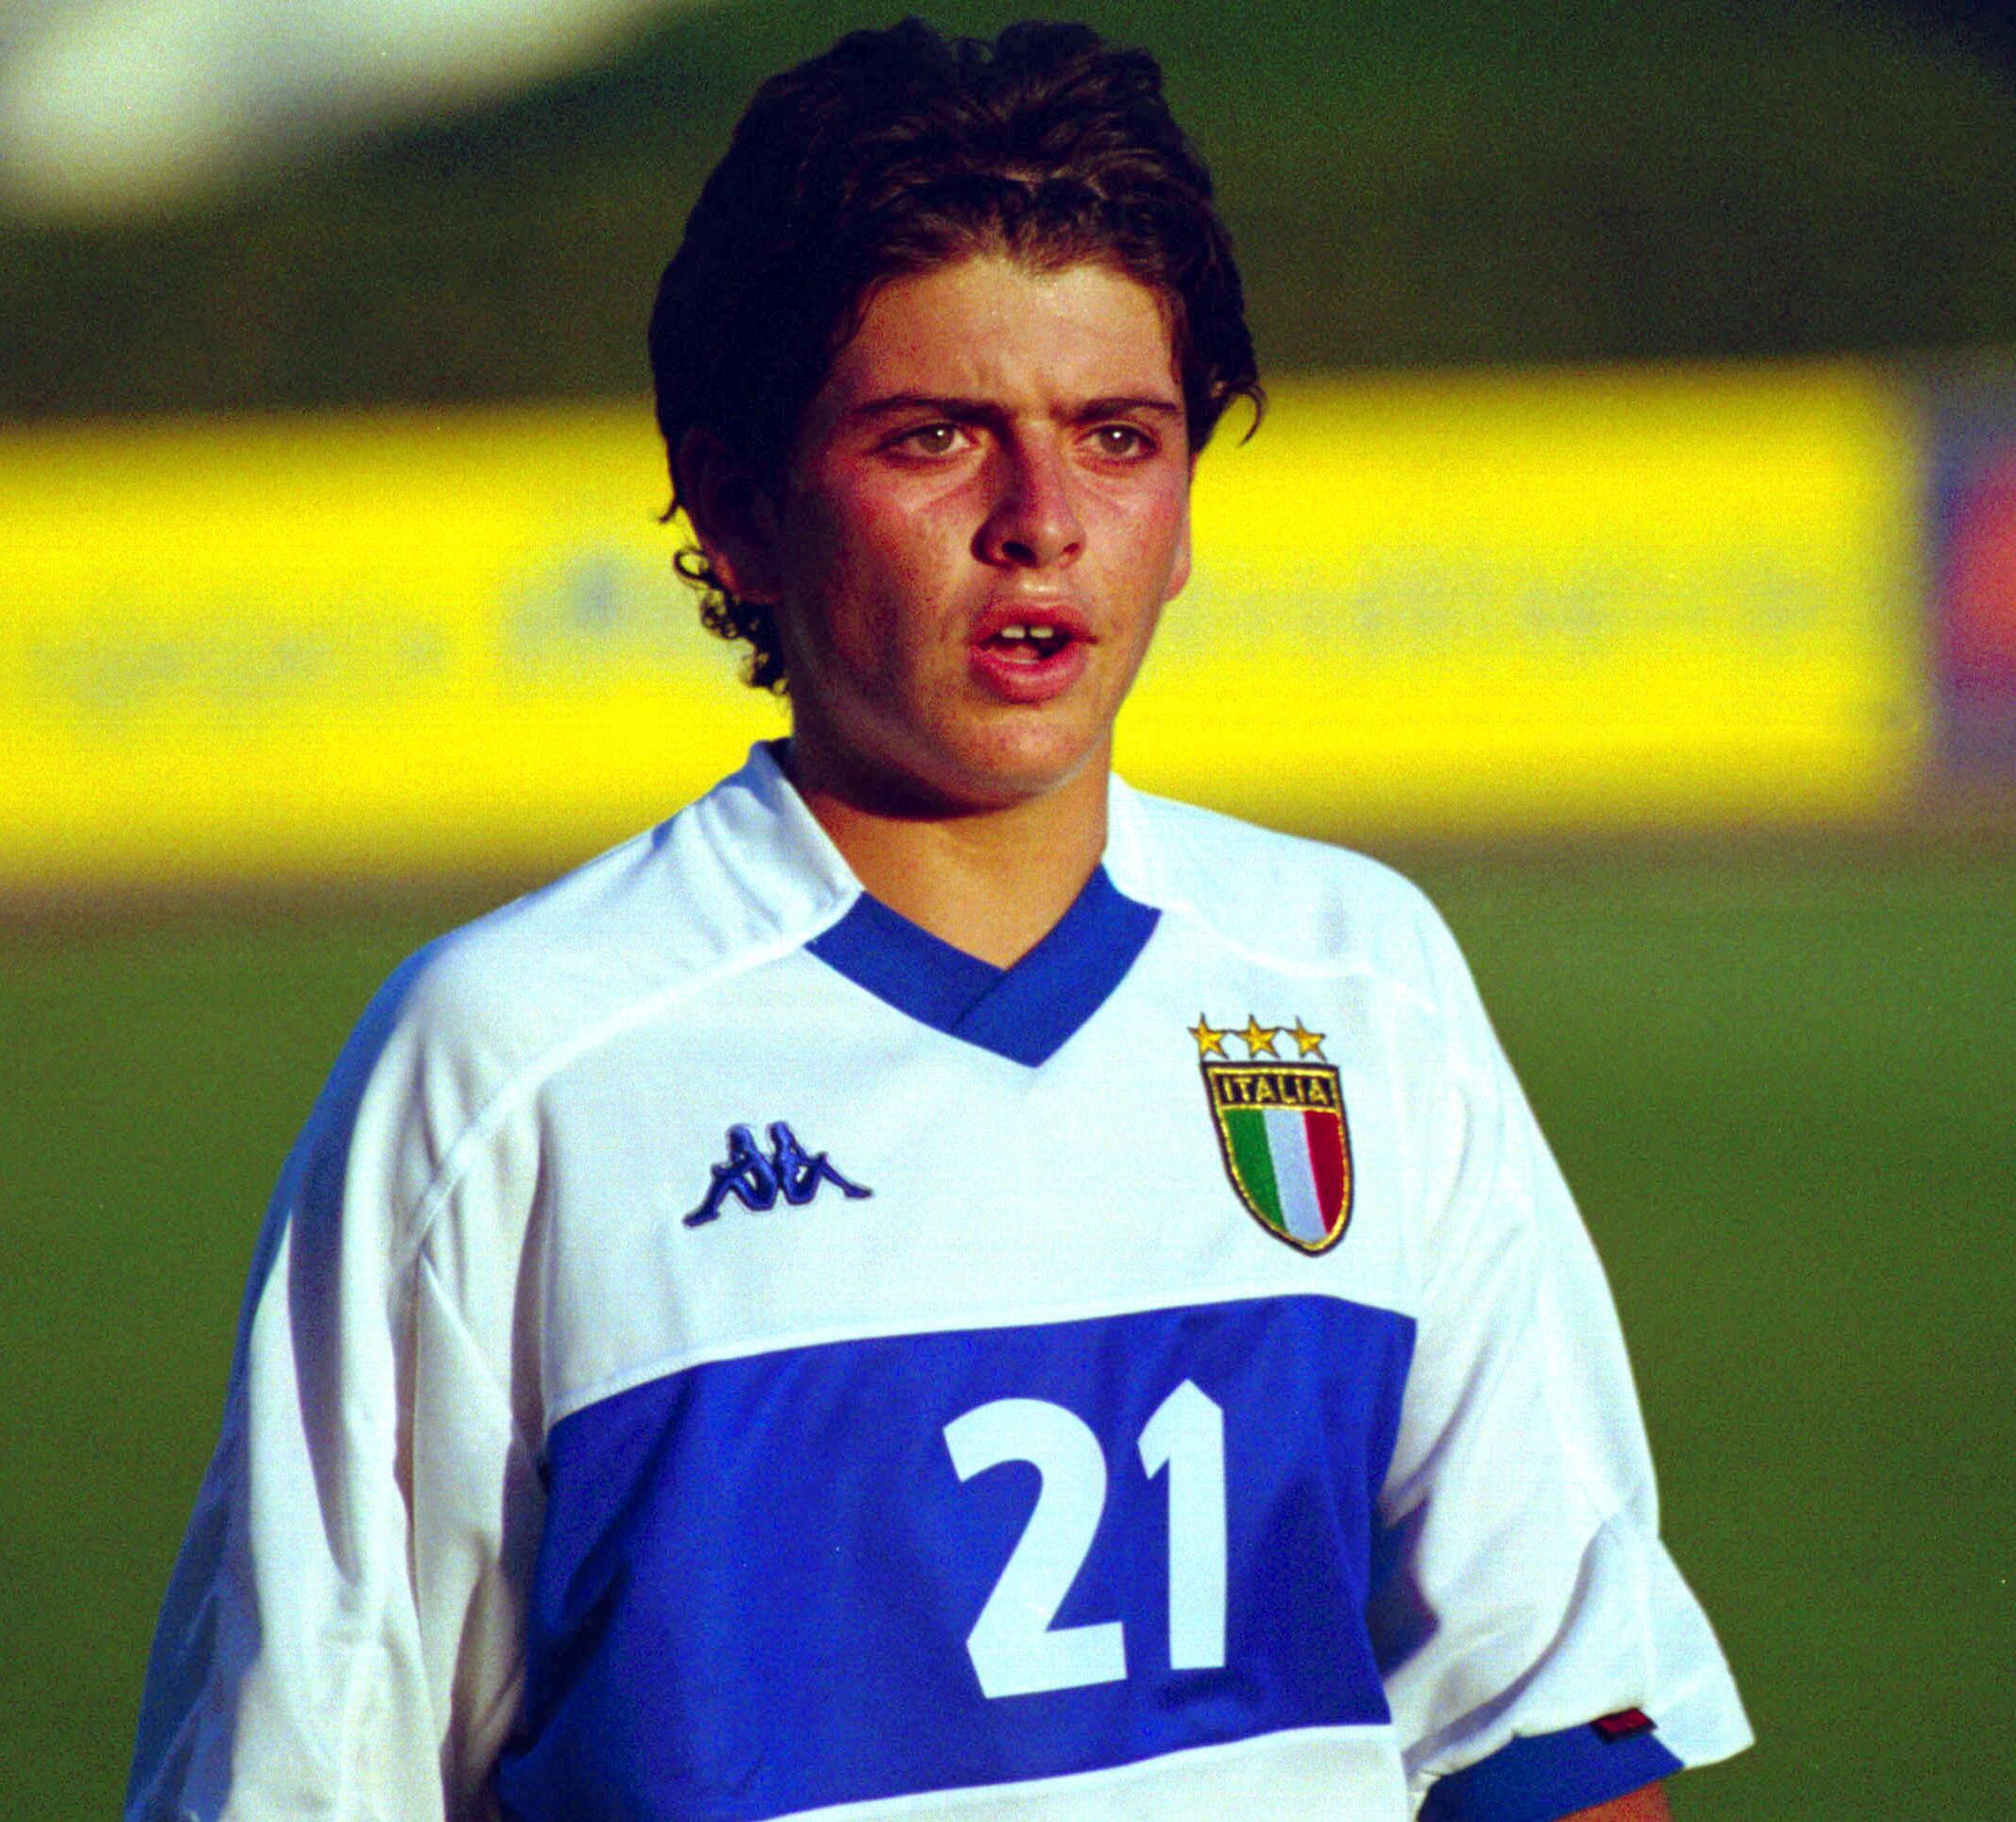 Bild zu Diego Maradona Junior, Sinagra, Diego Maradona, Italien, Nationalmannschaft, Florenz